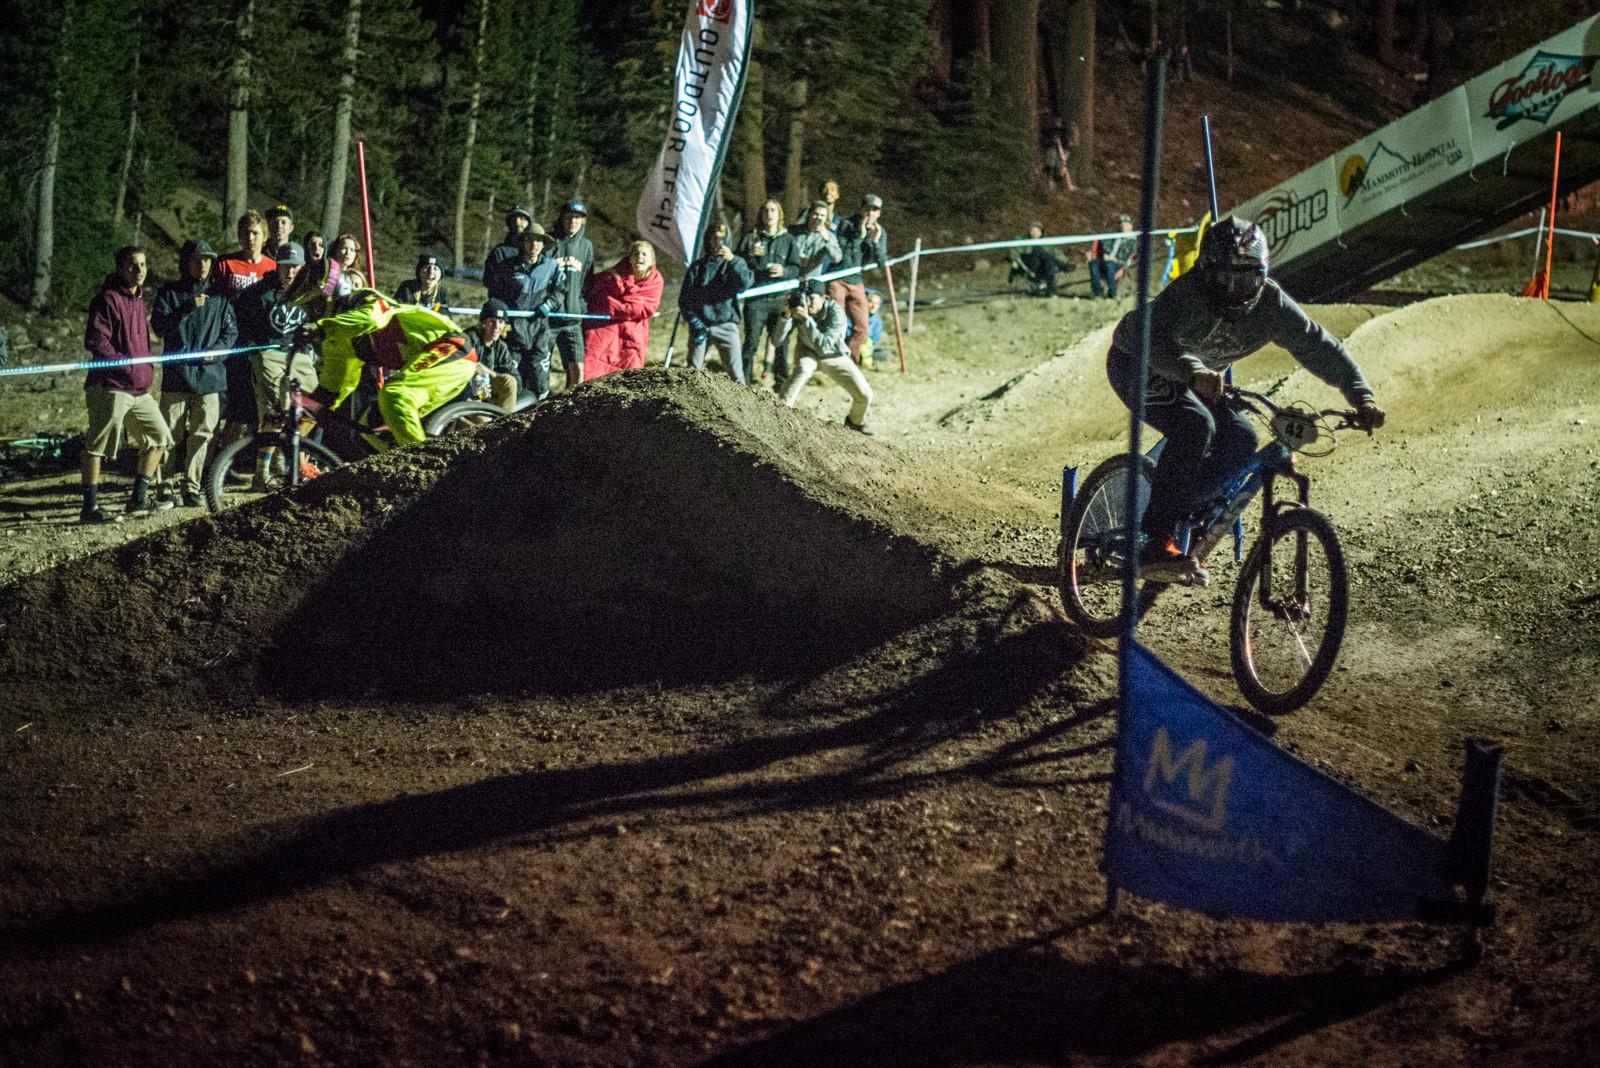 Cody Johnson & Cam Zink - Mammoth Mountain Kamikaze Bike Games Dual Slalom - Mountain Biking Pictures - Vital MTB